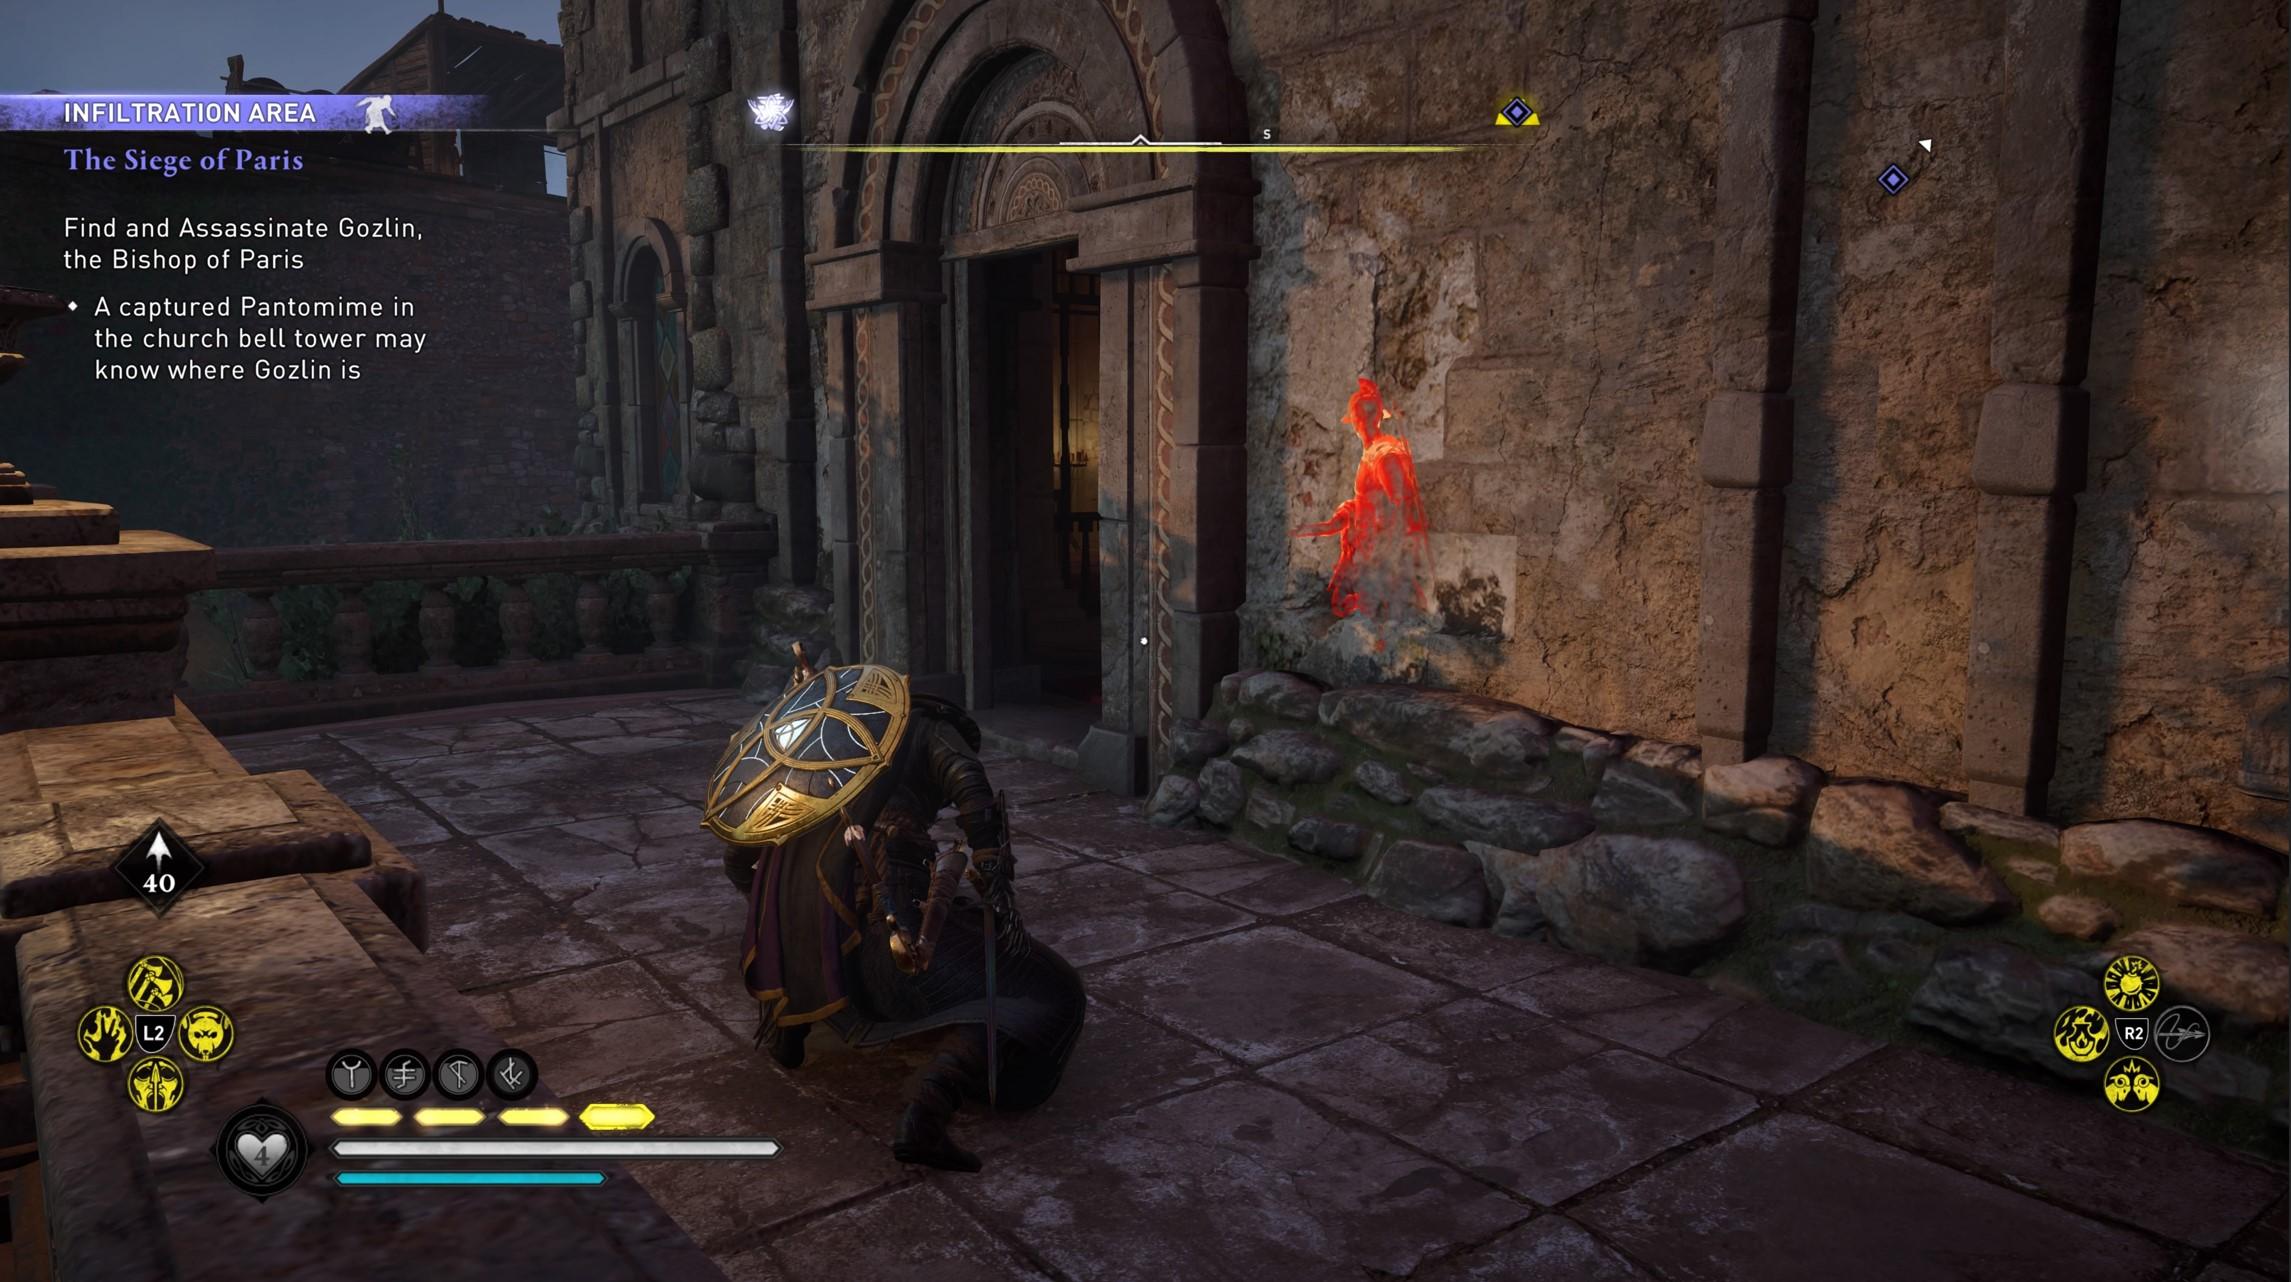 assassins creed valhalla gozlin assassination event path Assassin's Creed Valhalla Siege of Paris | Bishop Gozlin Assassination Event